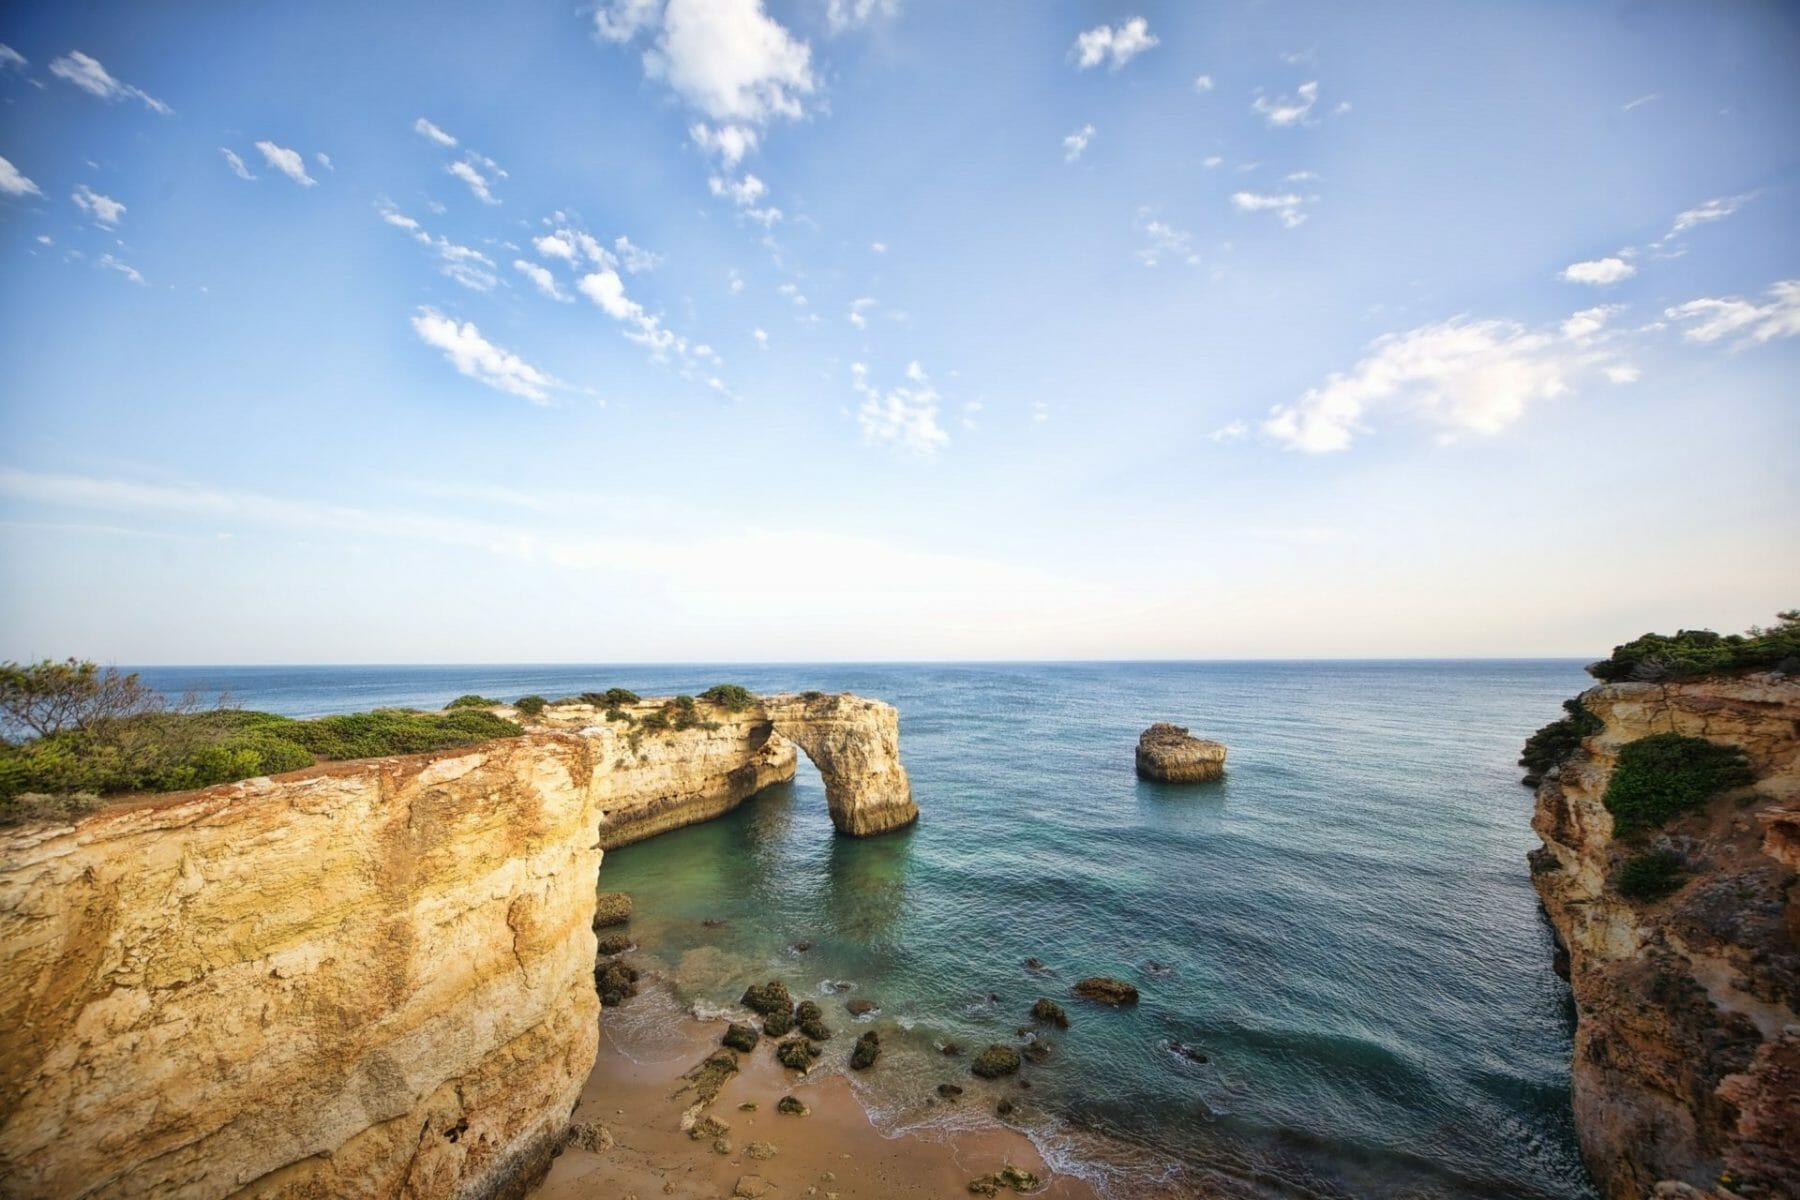 Yoga Woche - Felsenbogen am Praia da Albandeira